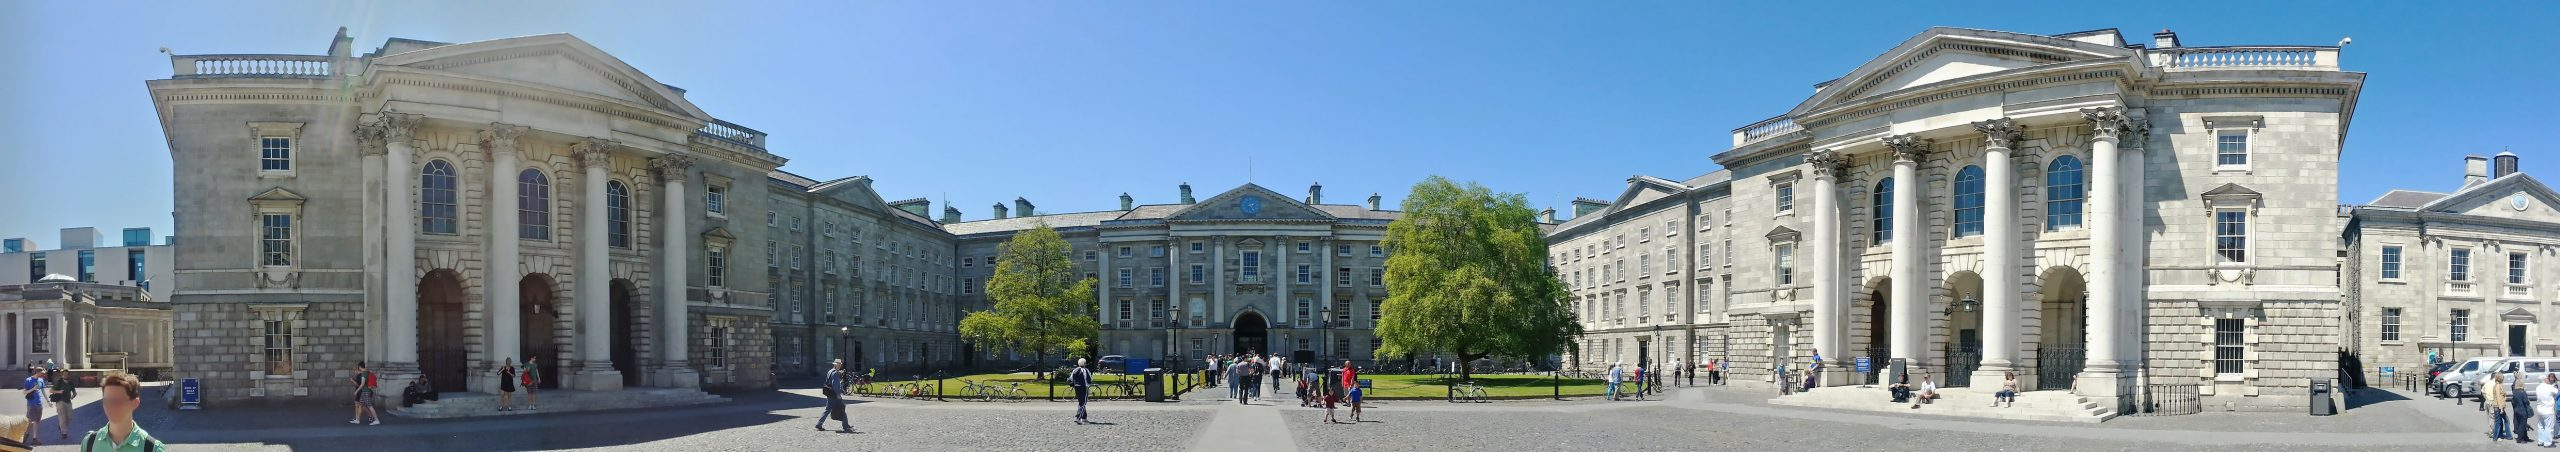 Estudiar en la escuela de inglés en Dublín ATC Language School Dublin